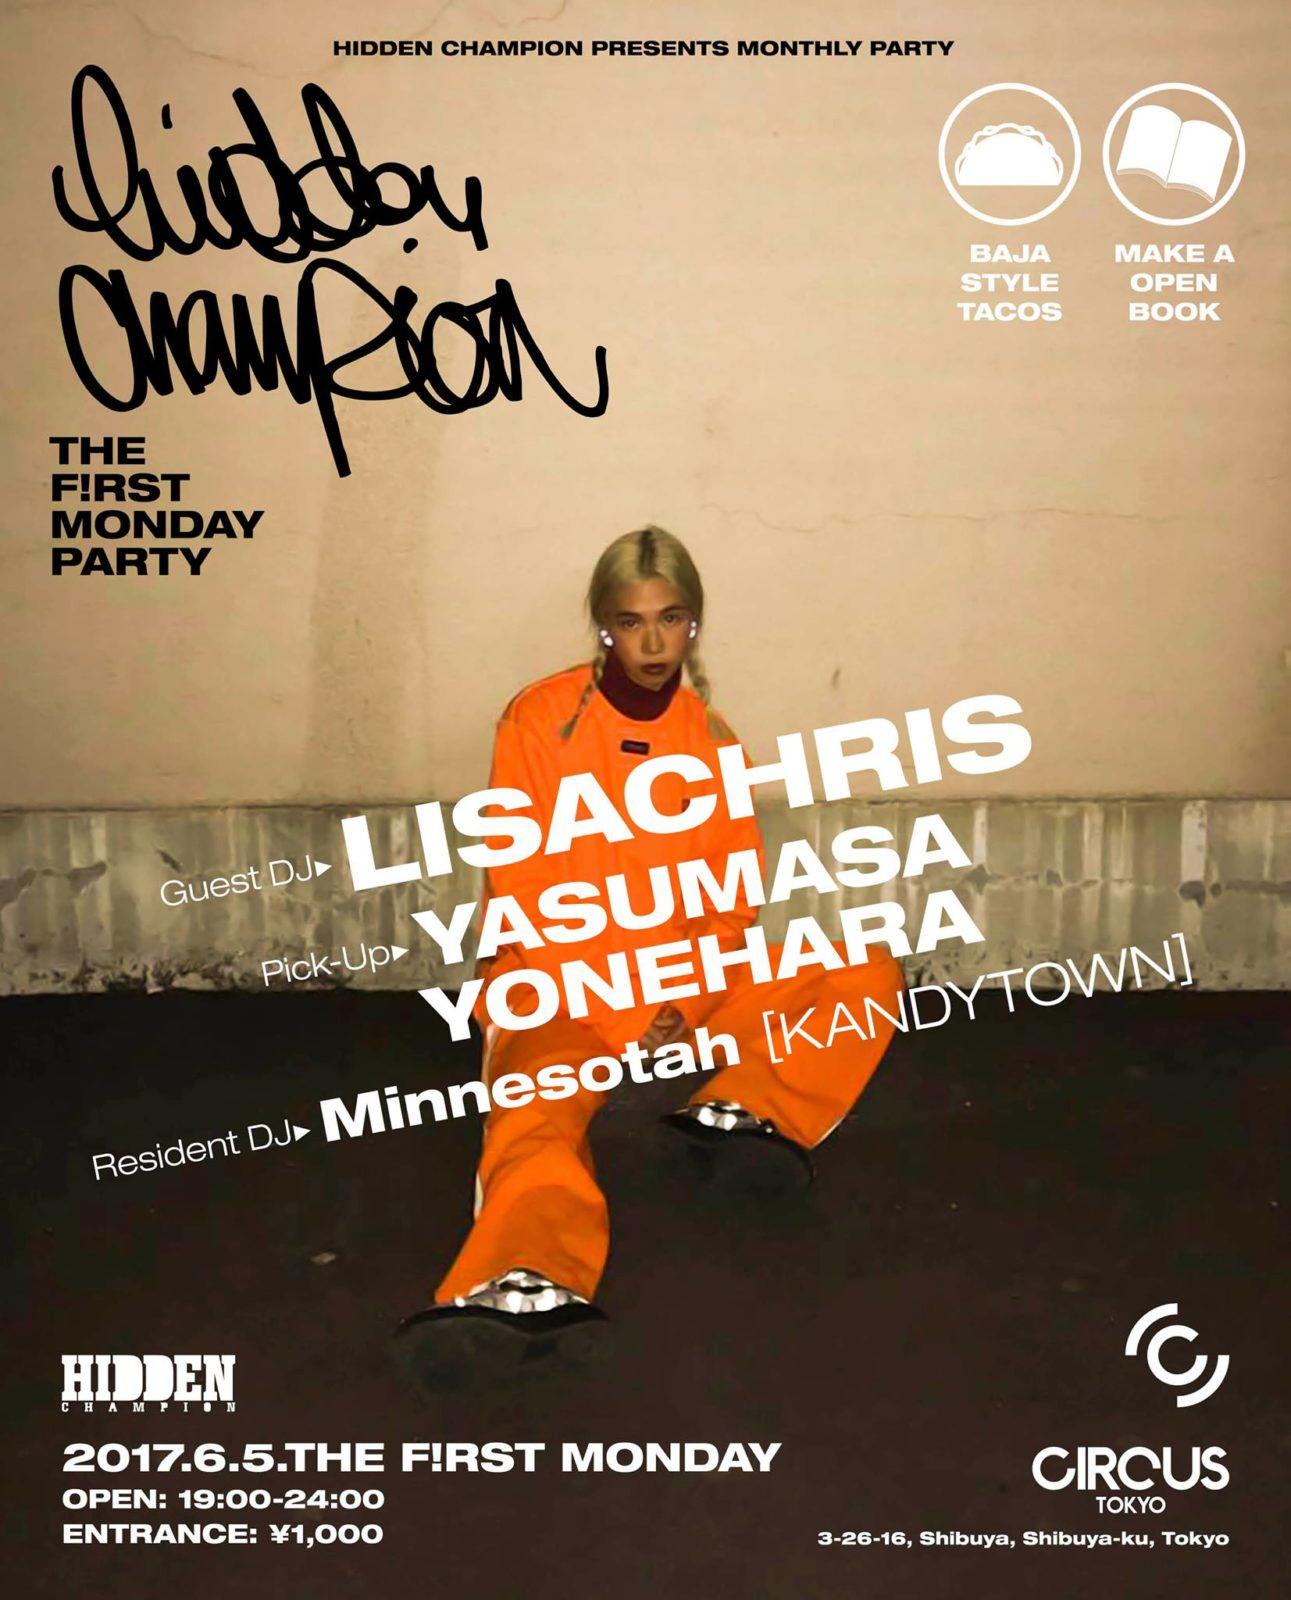 NY生まれロンドン・東京育ち、人気急上昇中の次世代アイコン・LISACHRISが「HIDDEN CHAMPION Presents Monthly Party」に登場サムネイル画像